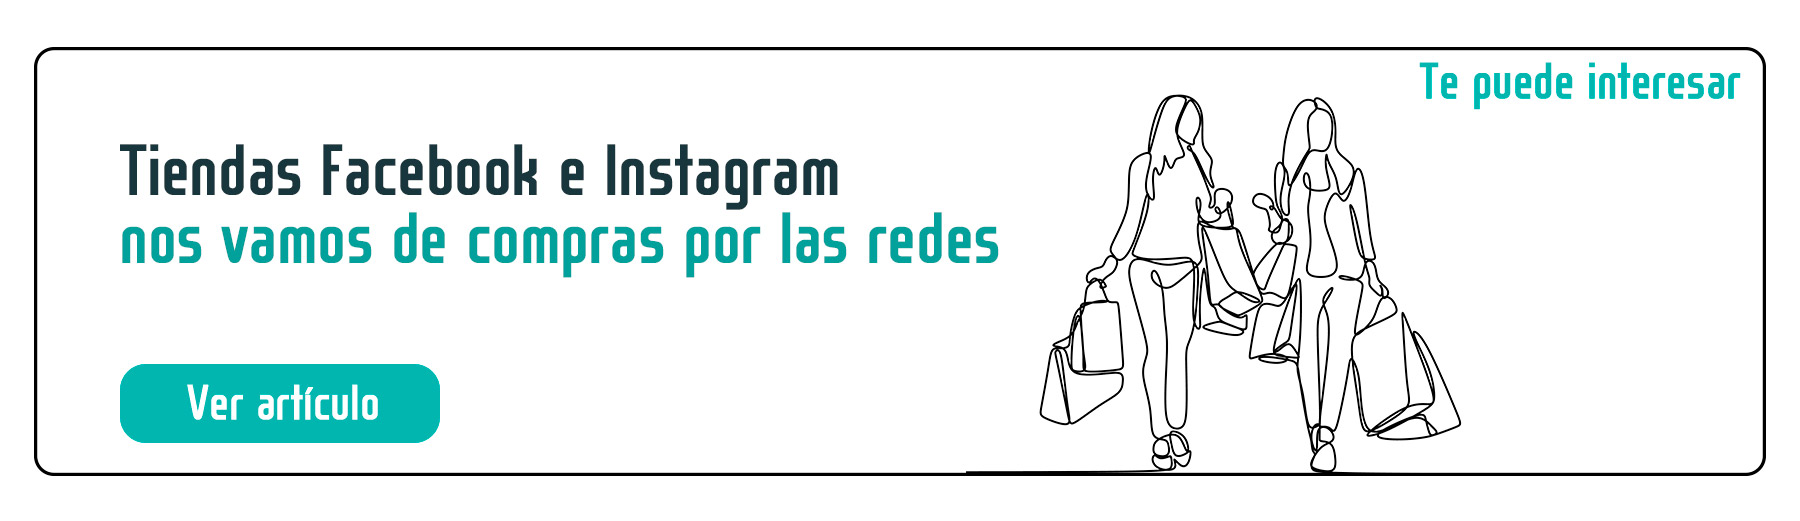 Tiendas Facebook e Instagram